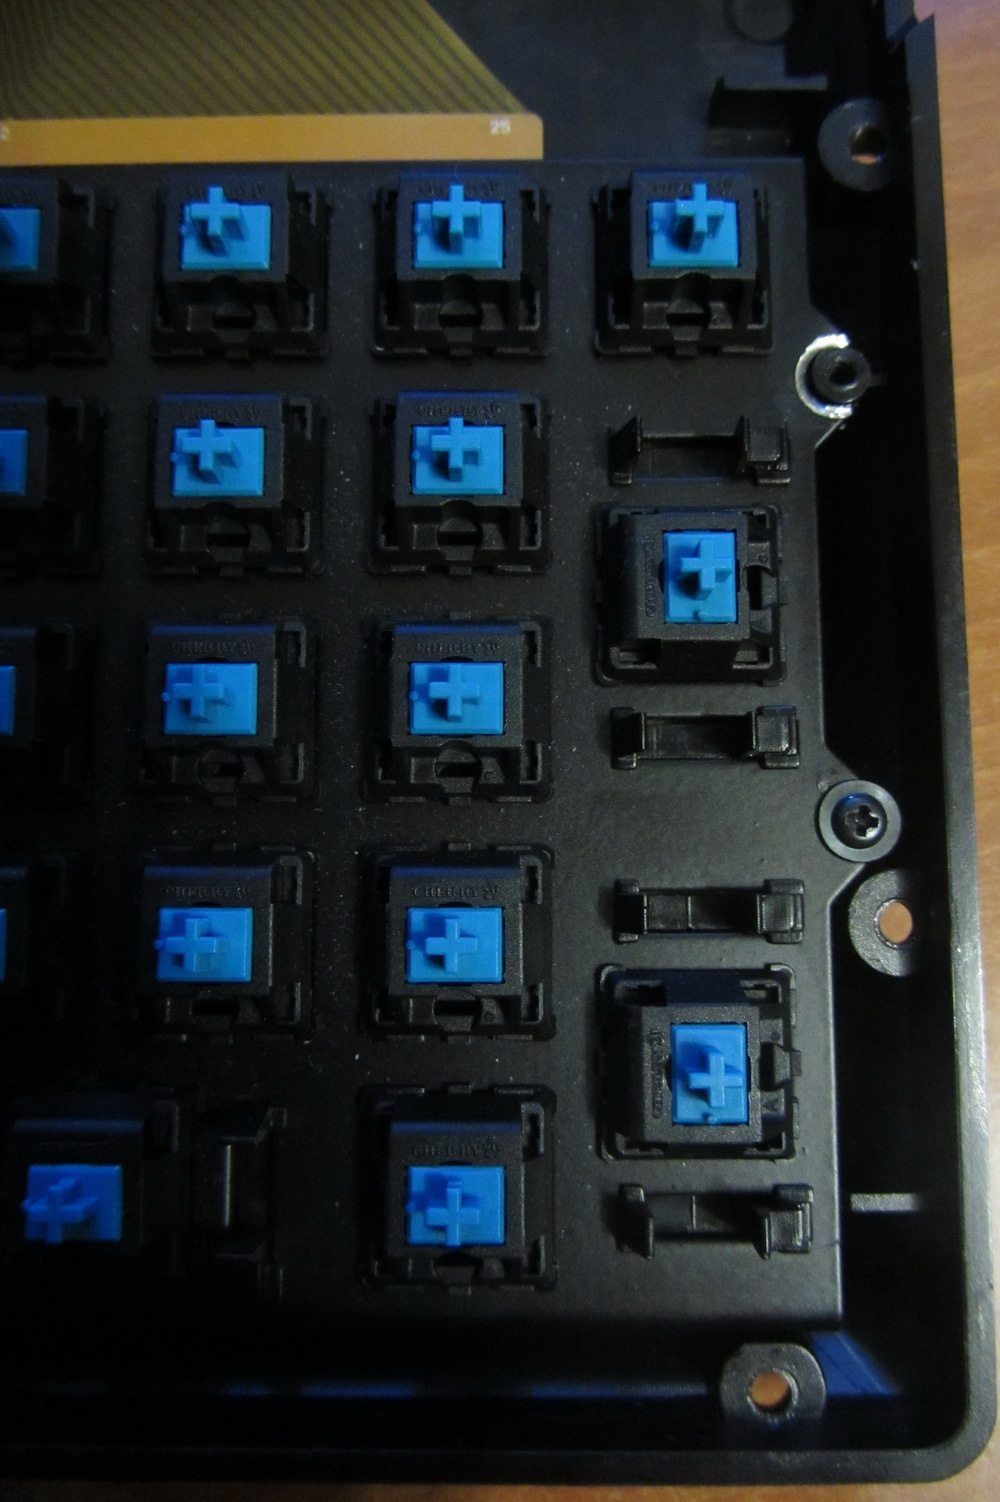 Обзор и разбор клавиатуры Das Keyboard 4 Professional Clicky - 30